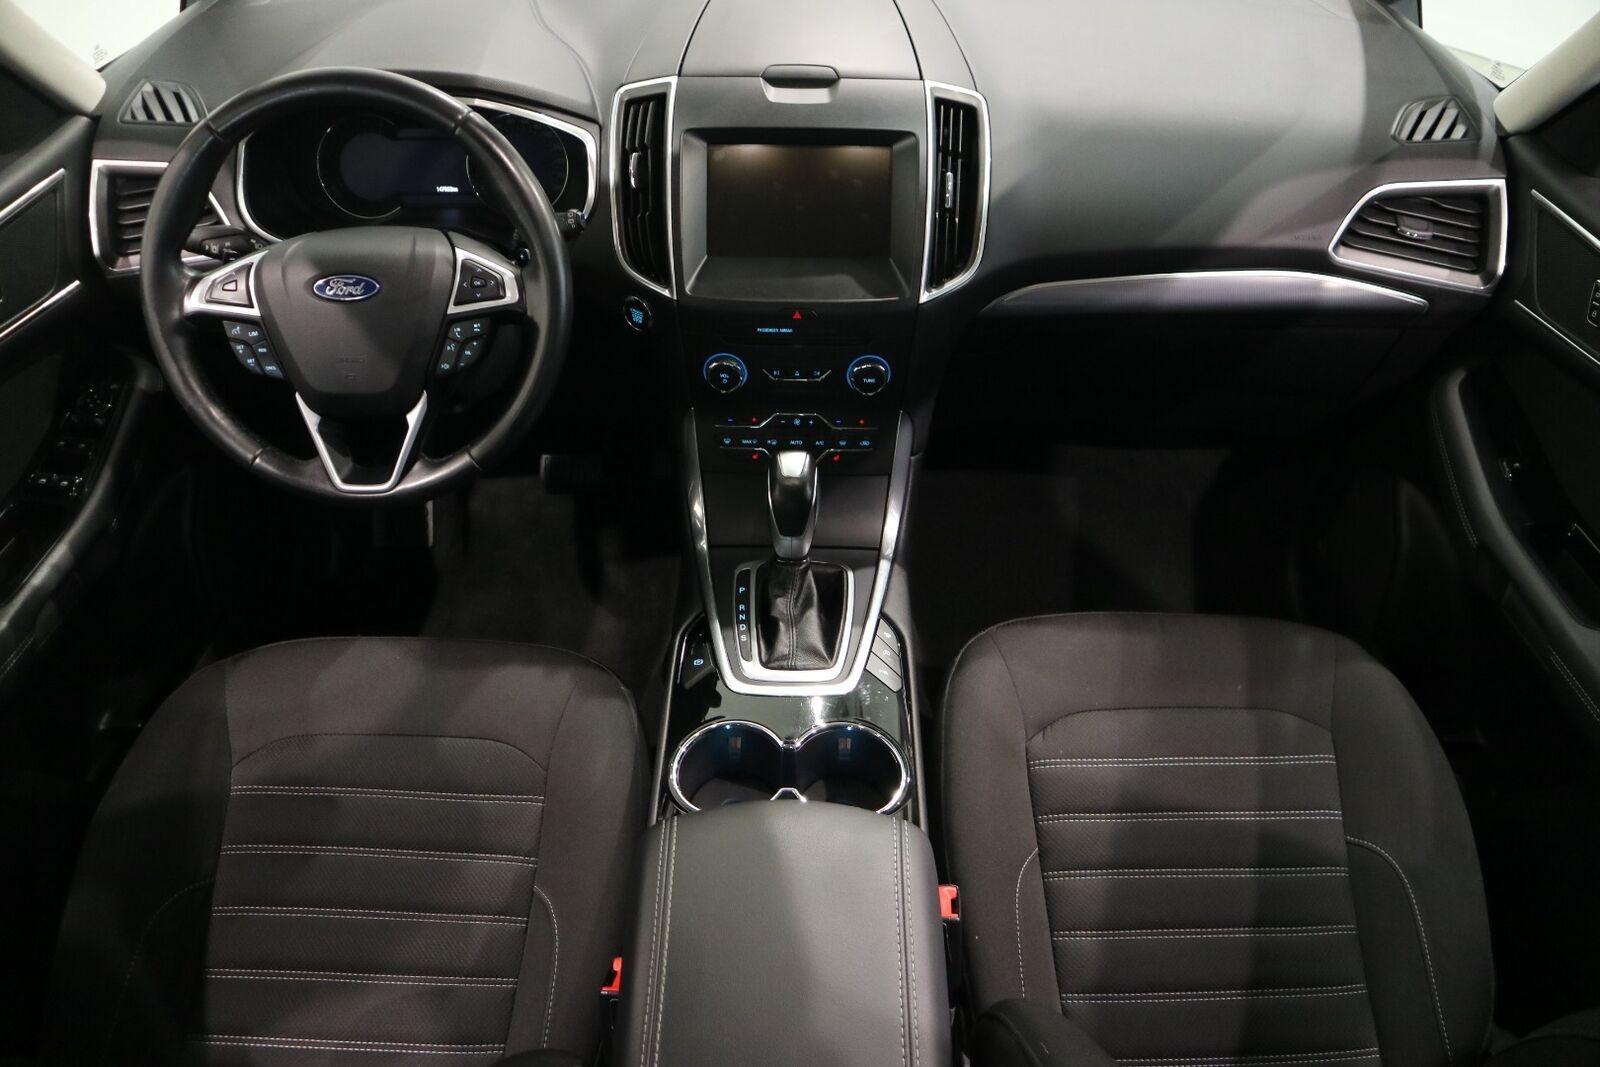 Ford Galaxy 2,0 TDCi 180 Titanium aut. - billede 15